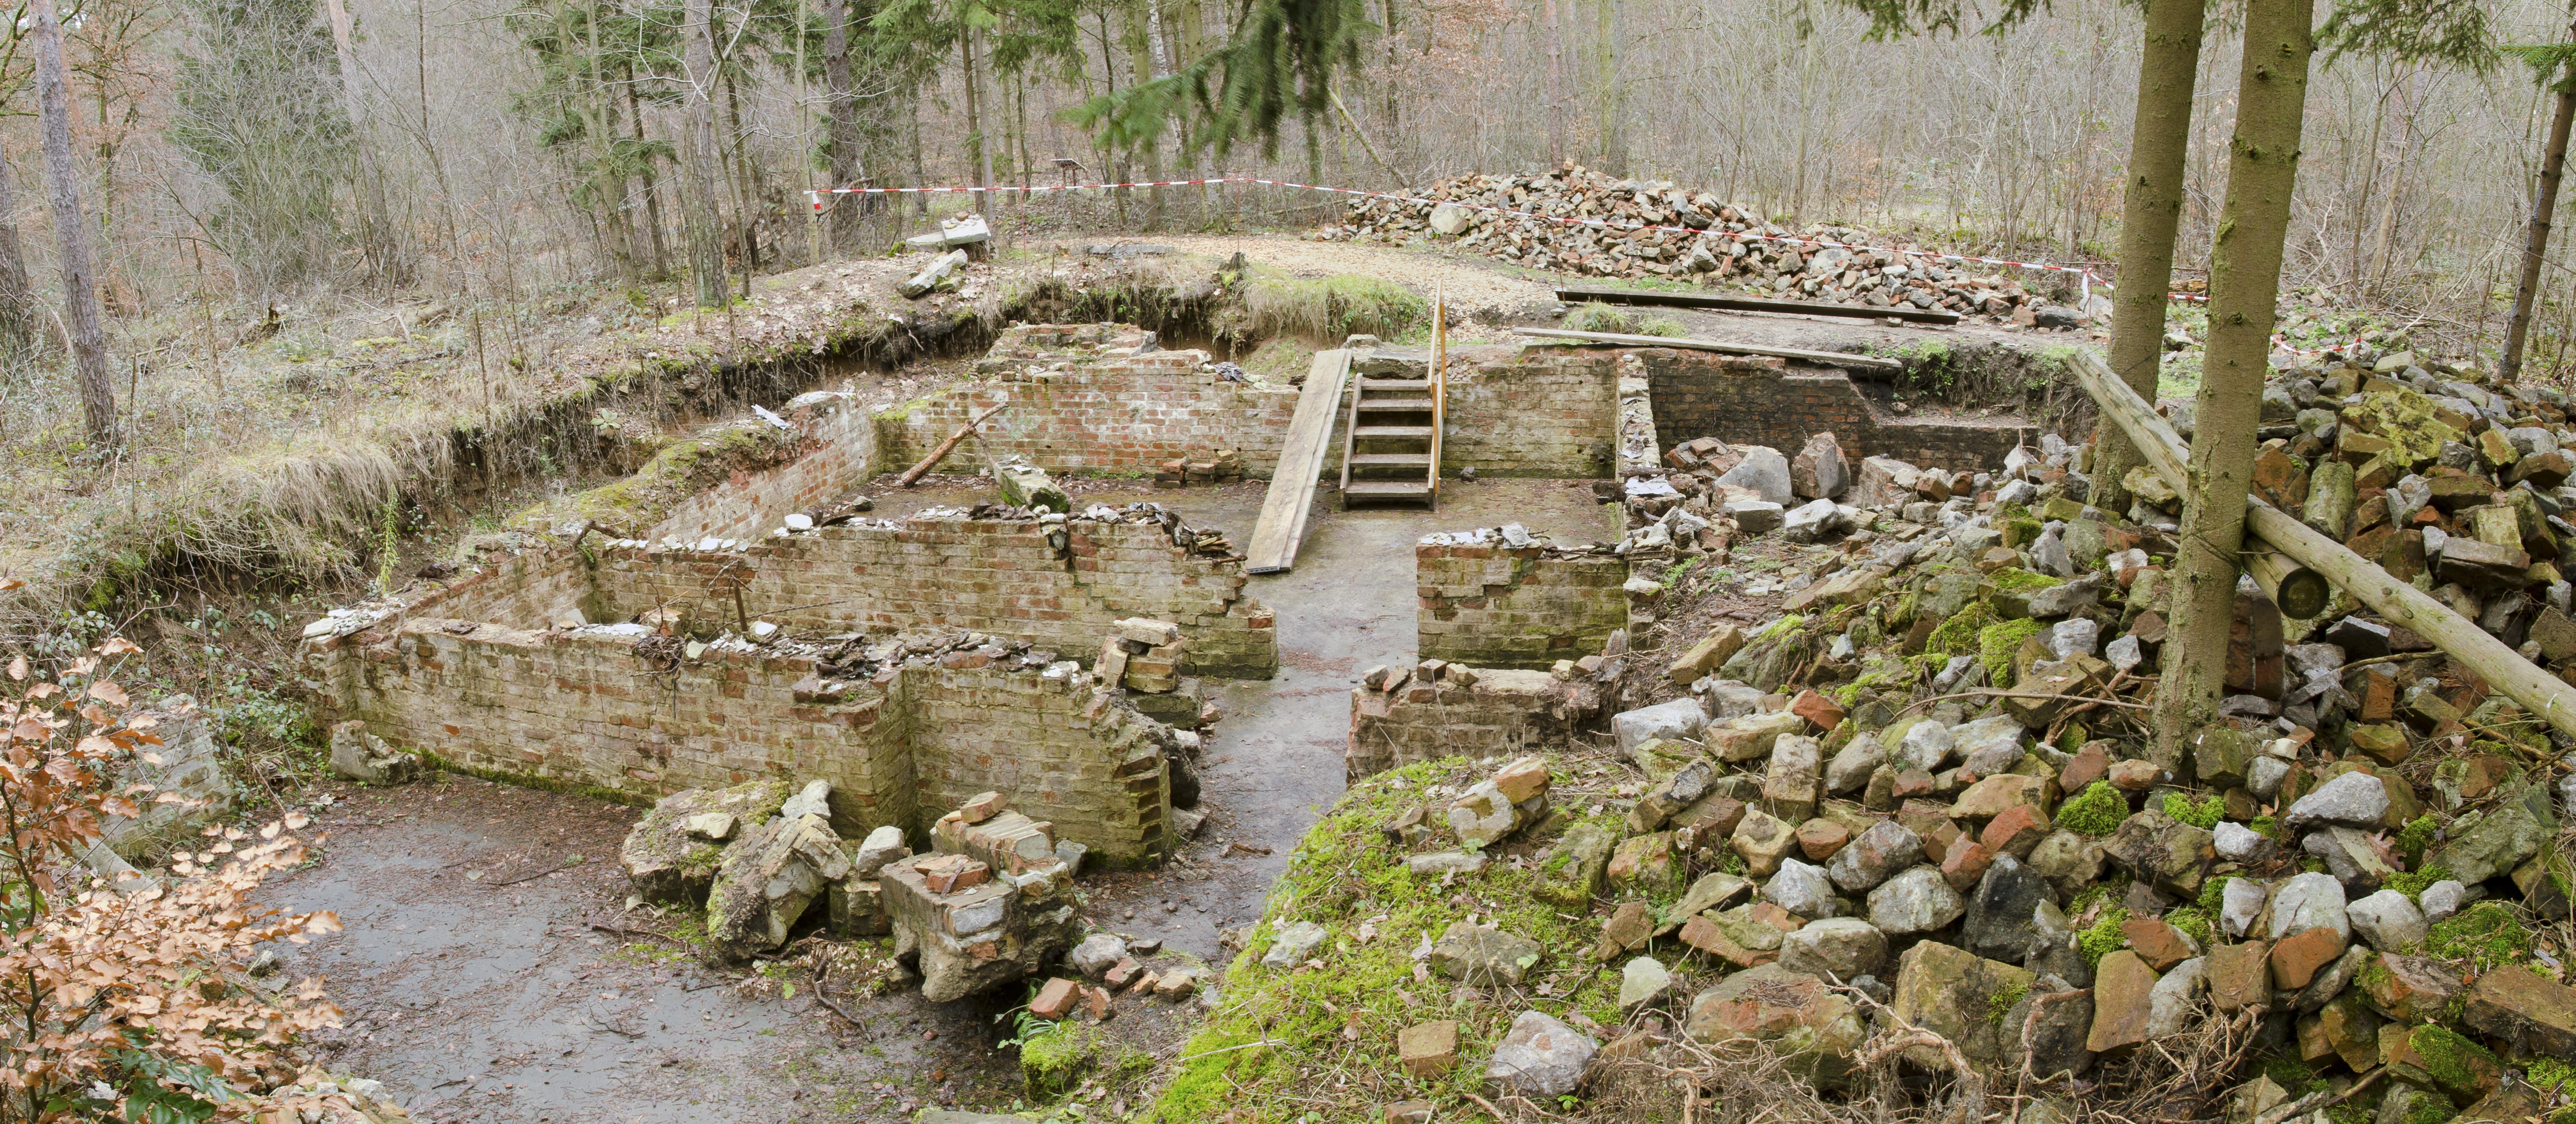 File:Former cellar of kitchen barrack - Nazi labour camp Walldorf ...